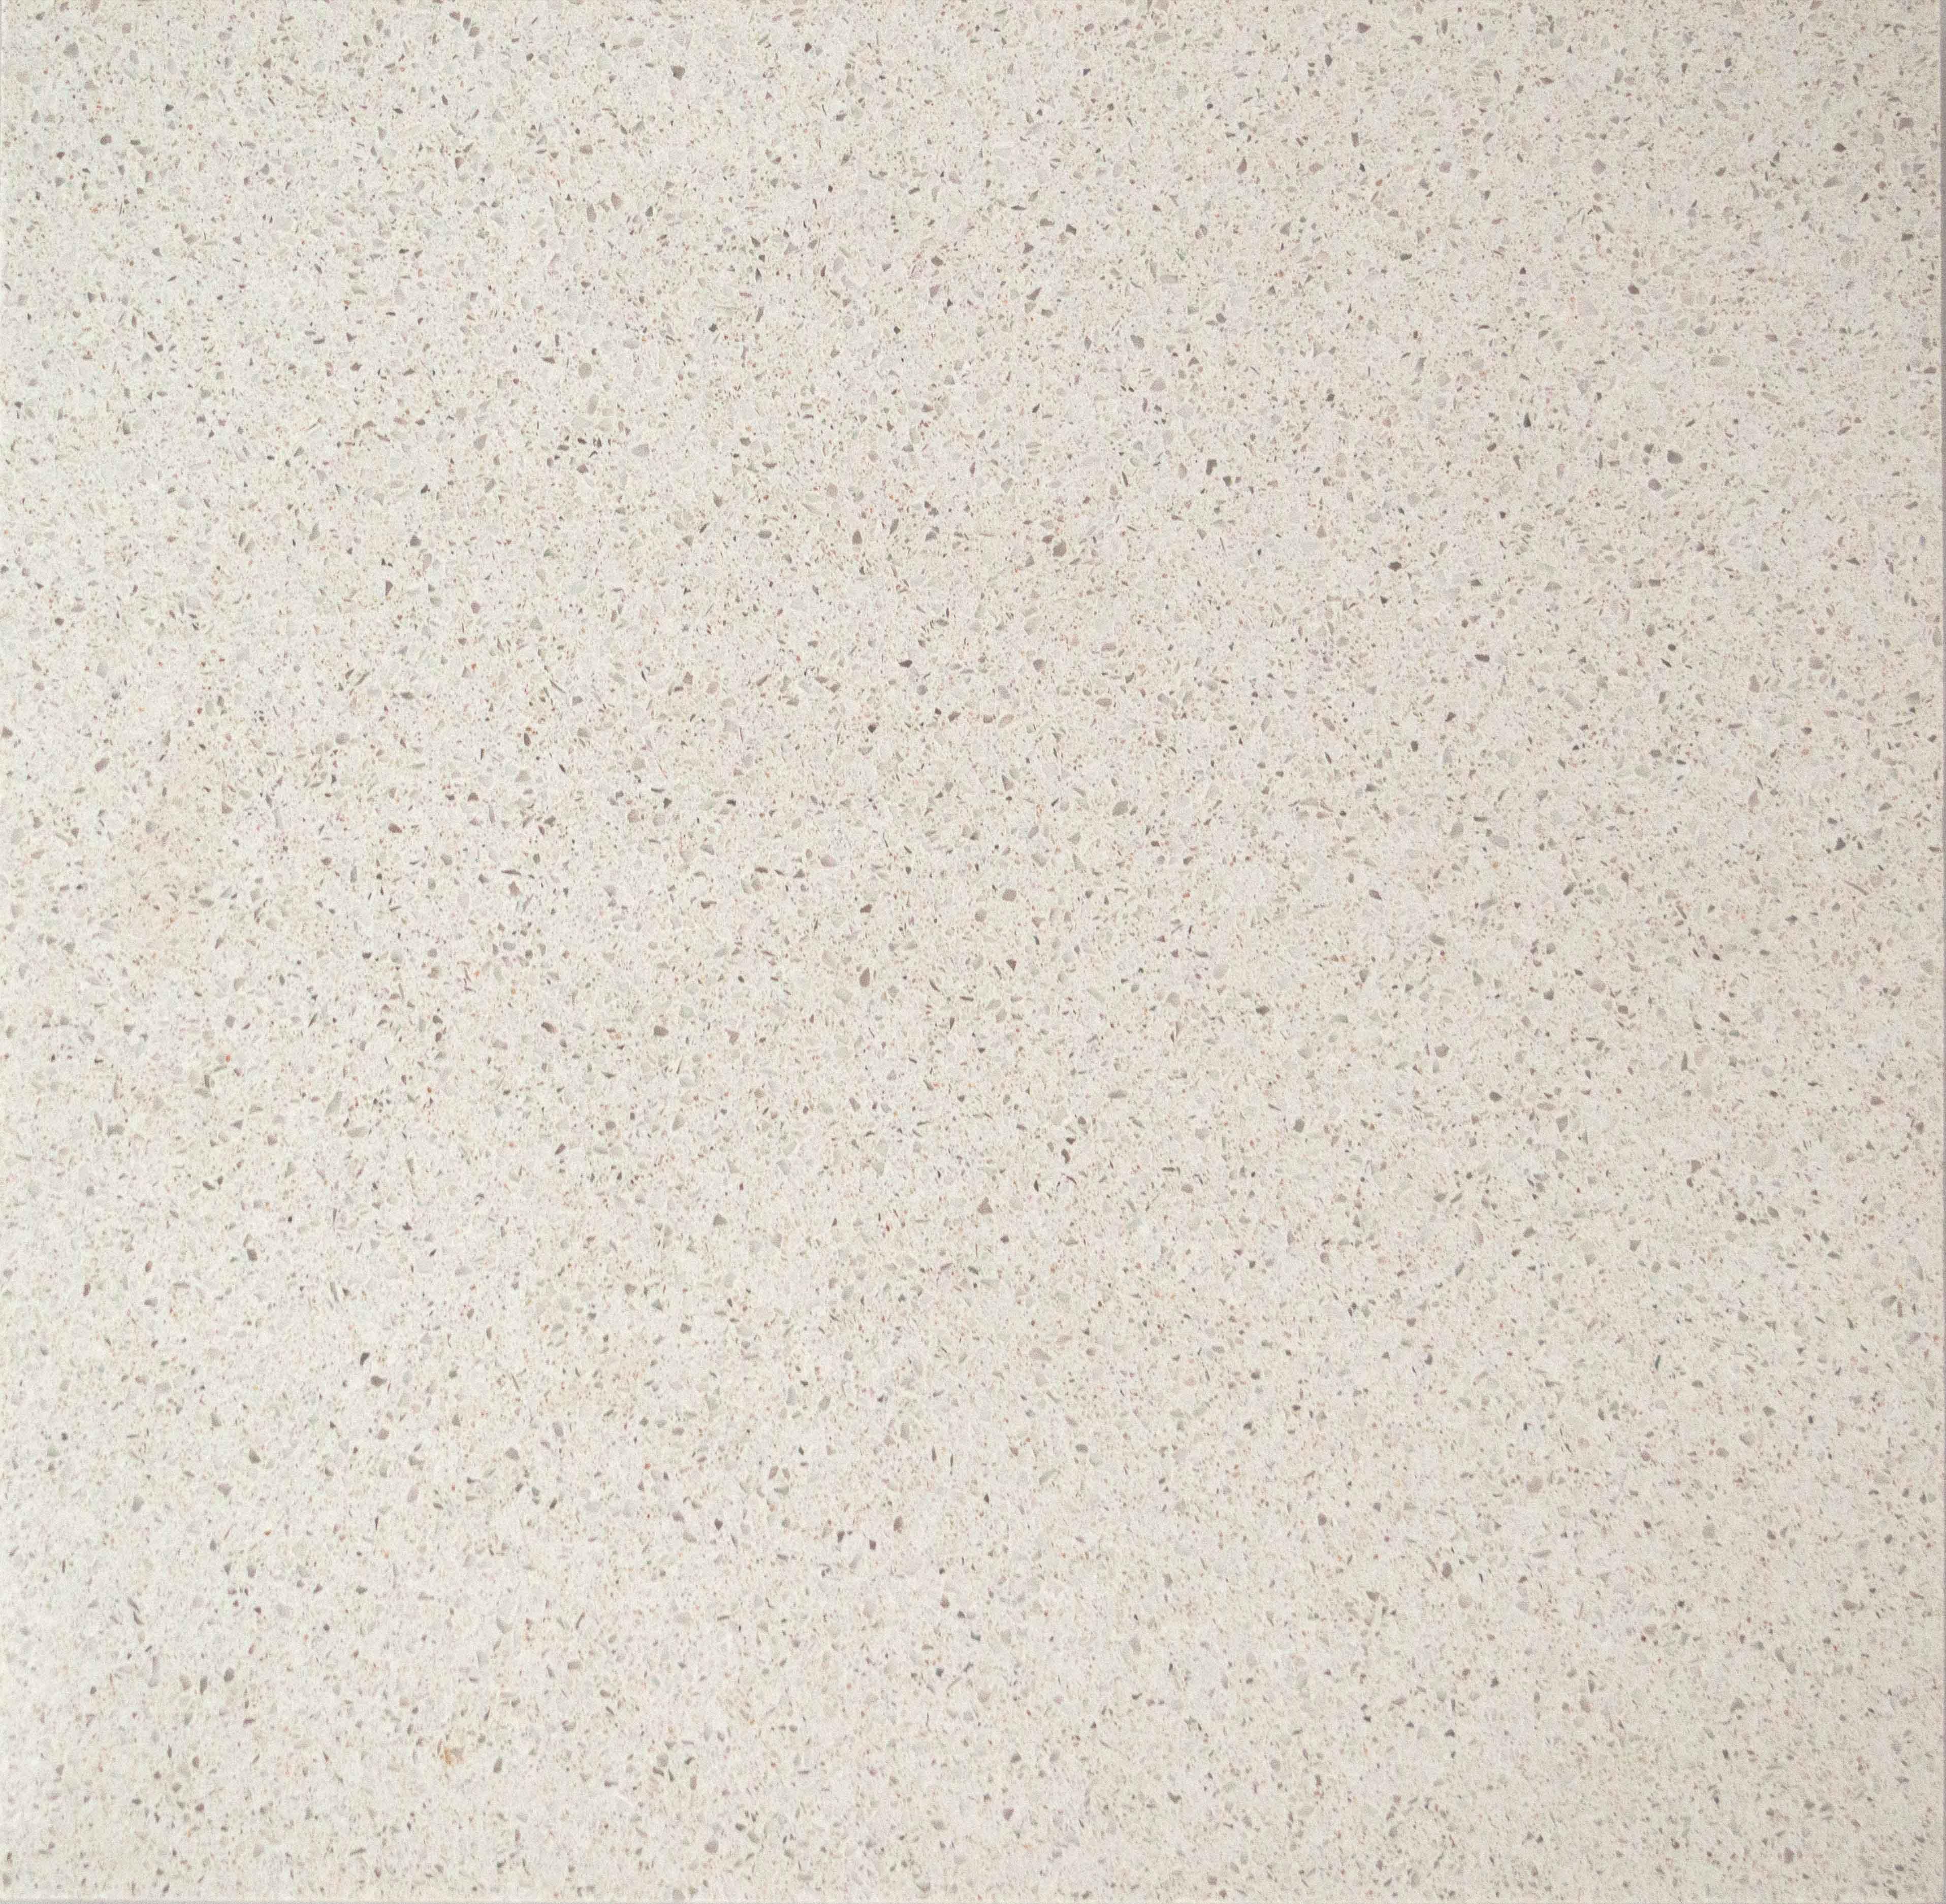 Technistone - Exterior White